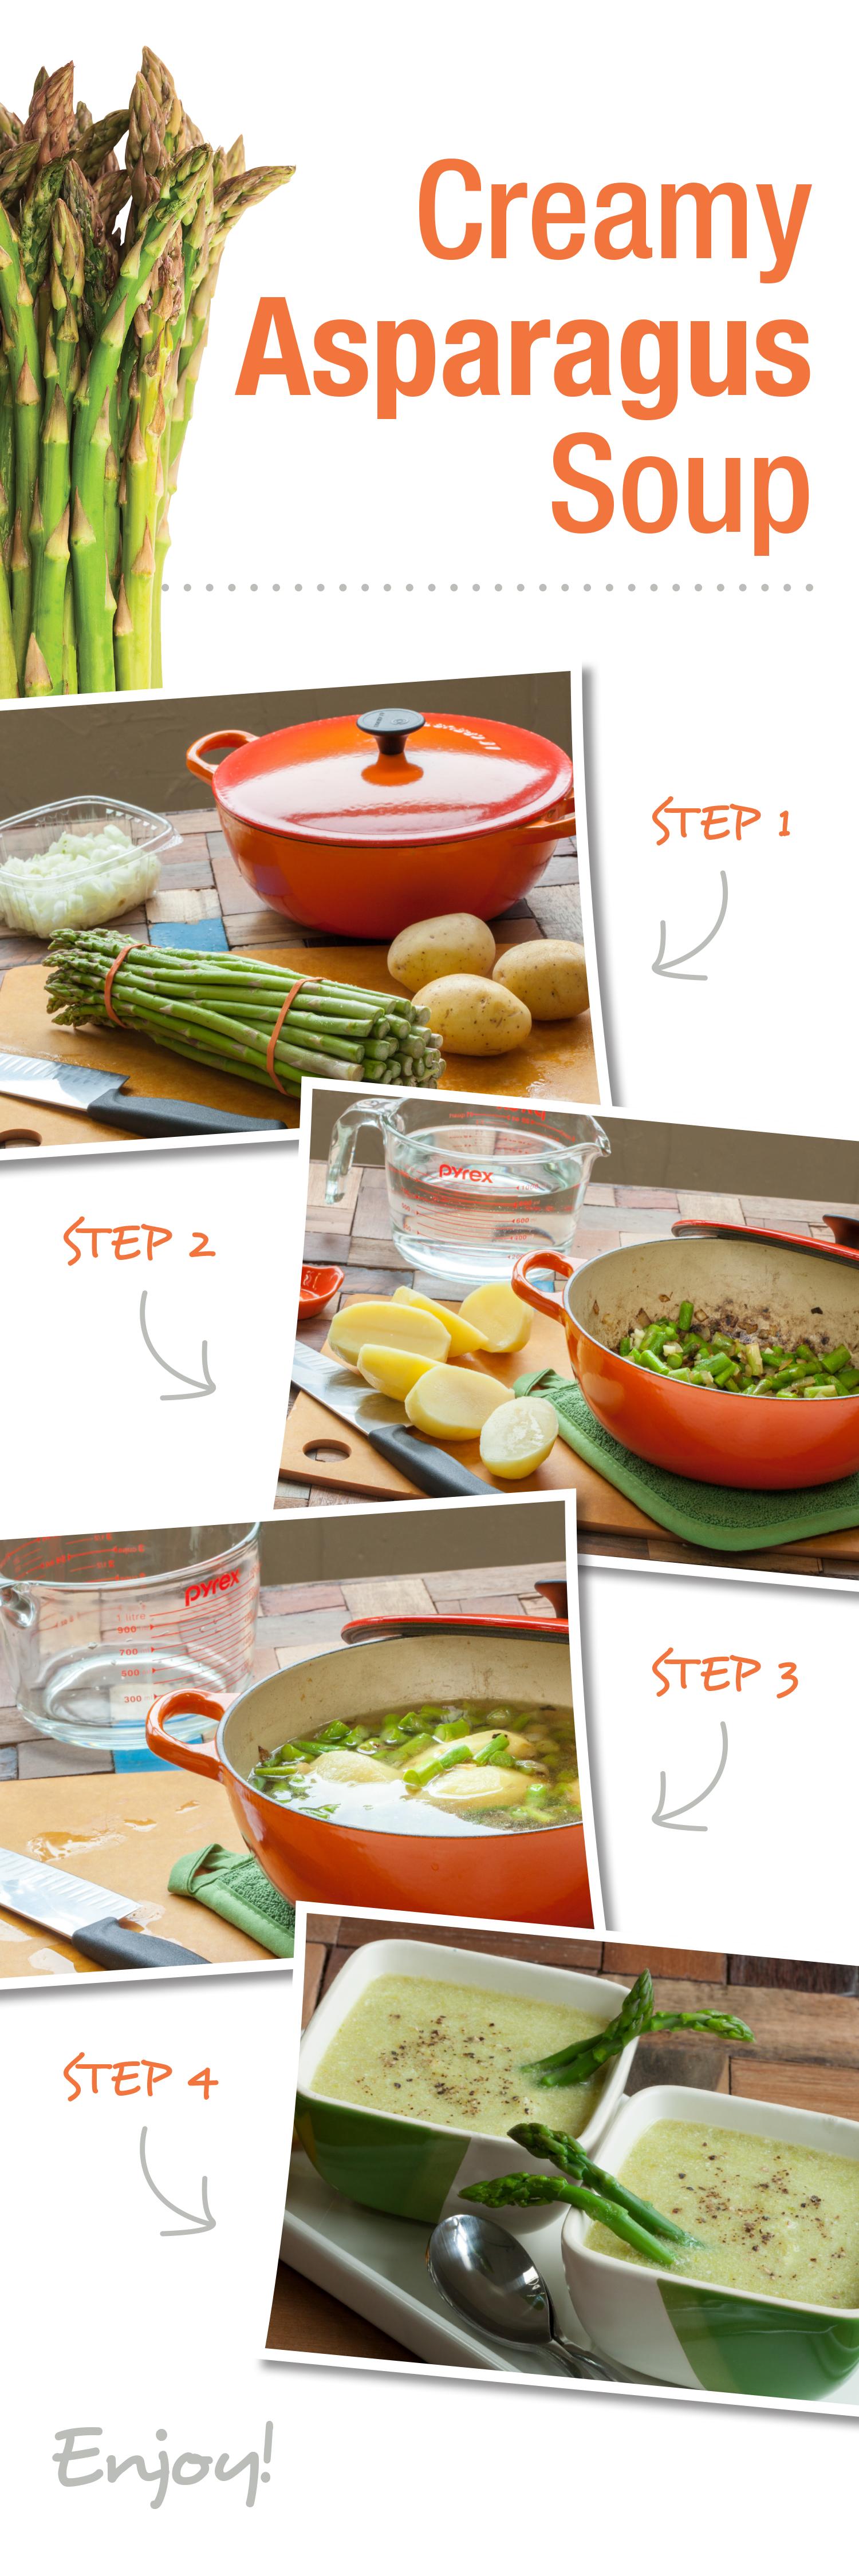 how to make creamed asparagus